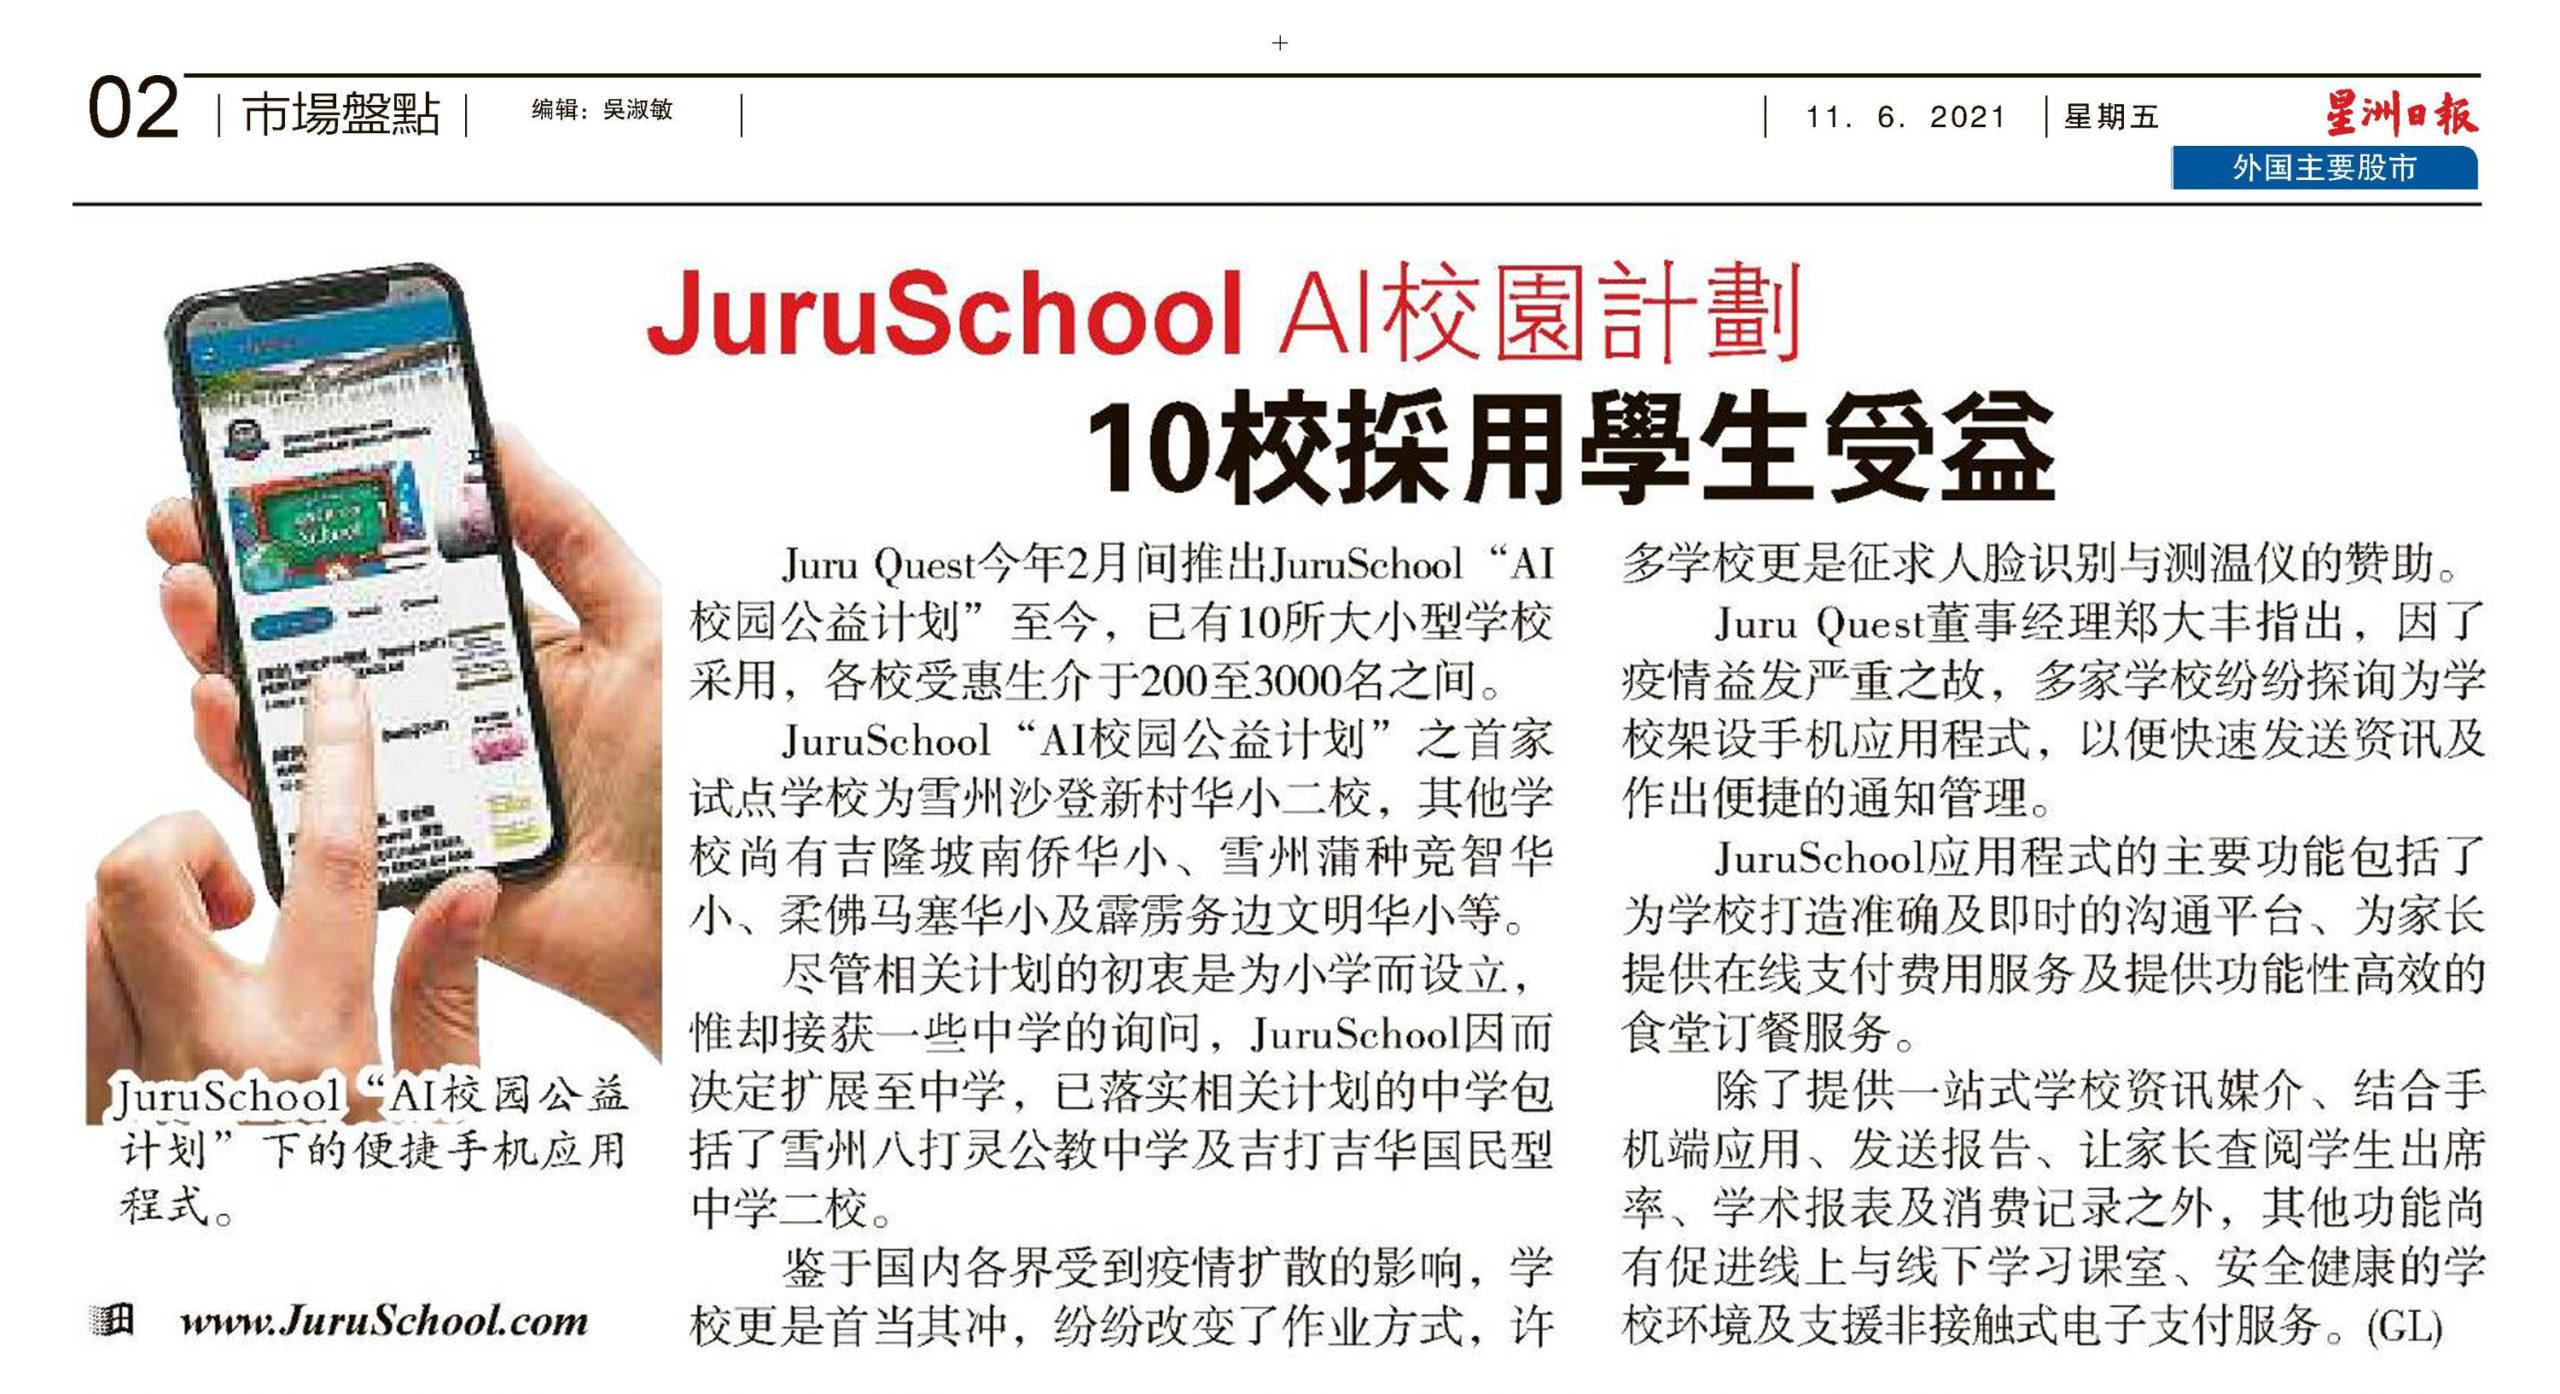 JuruSchool in Sin Chew Newspaper